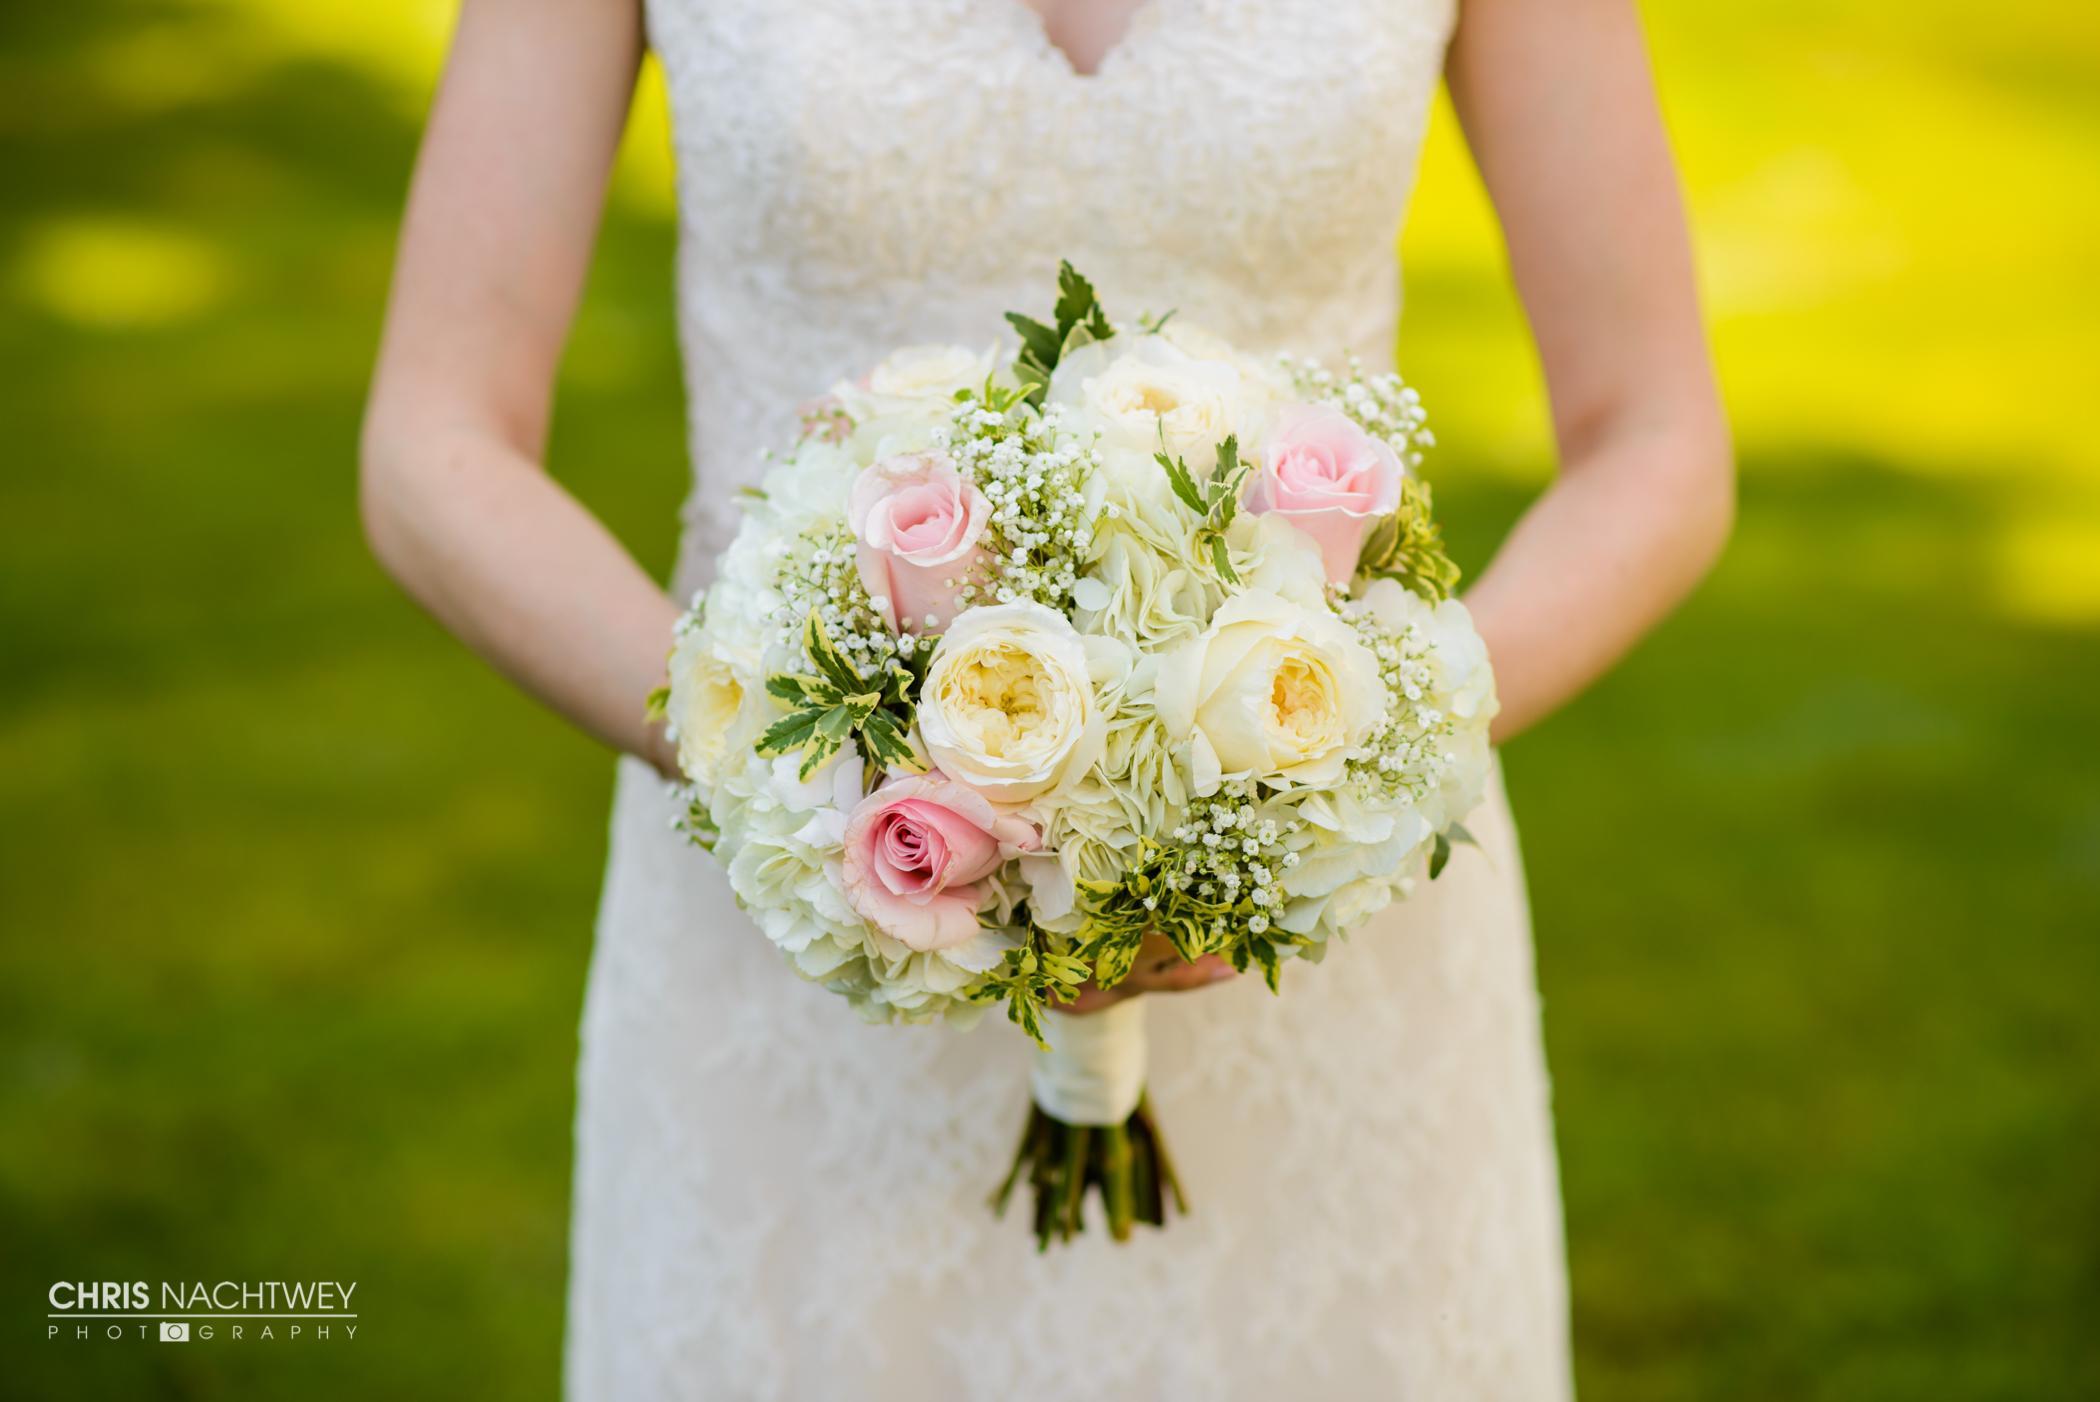 inn-at-mystic-connecticut-wedding-photographer-chris-nachtwey-18.jpg